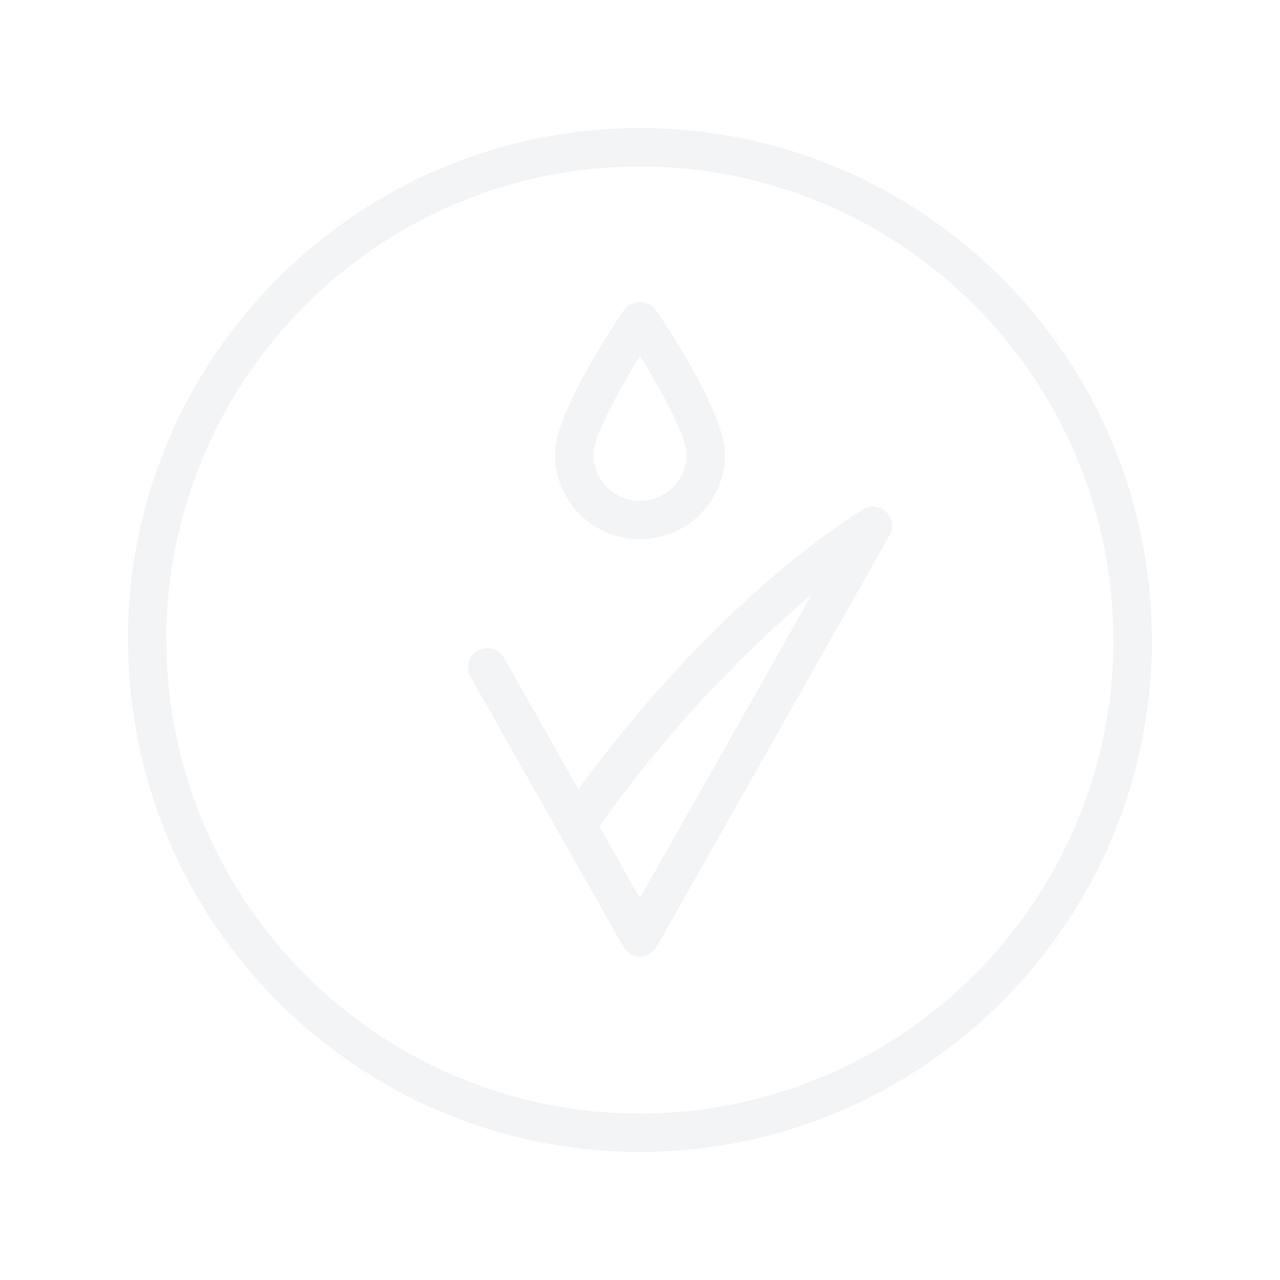 MISSHA Oil Control Film (Blue) rasueritust kontrolliv kile 50pcs